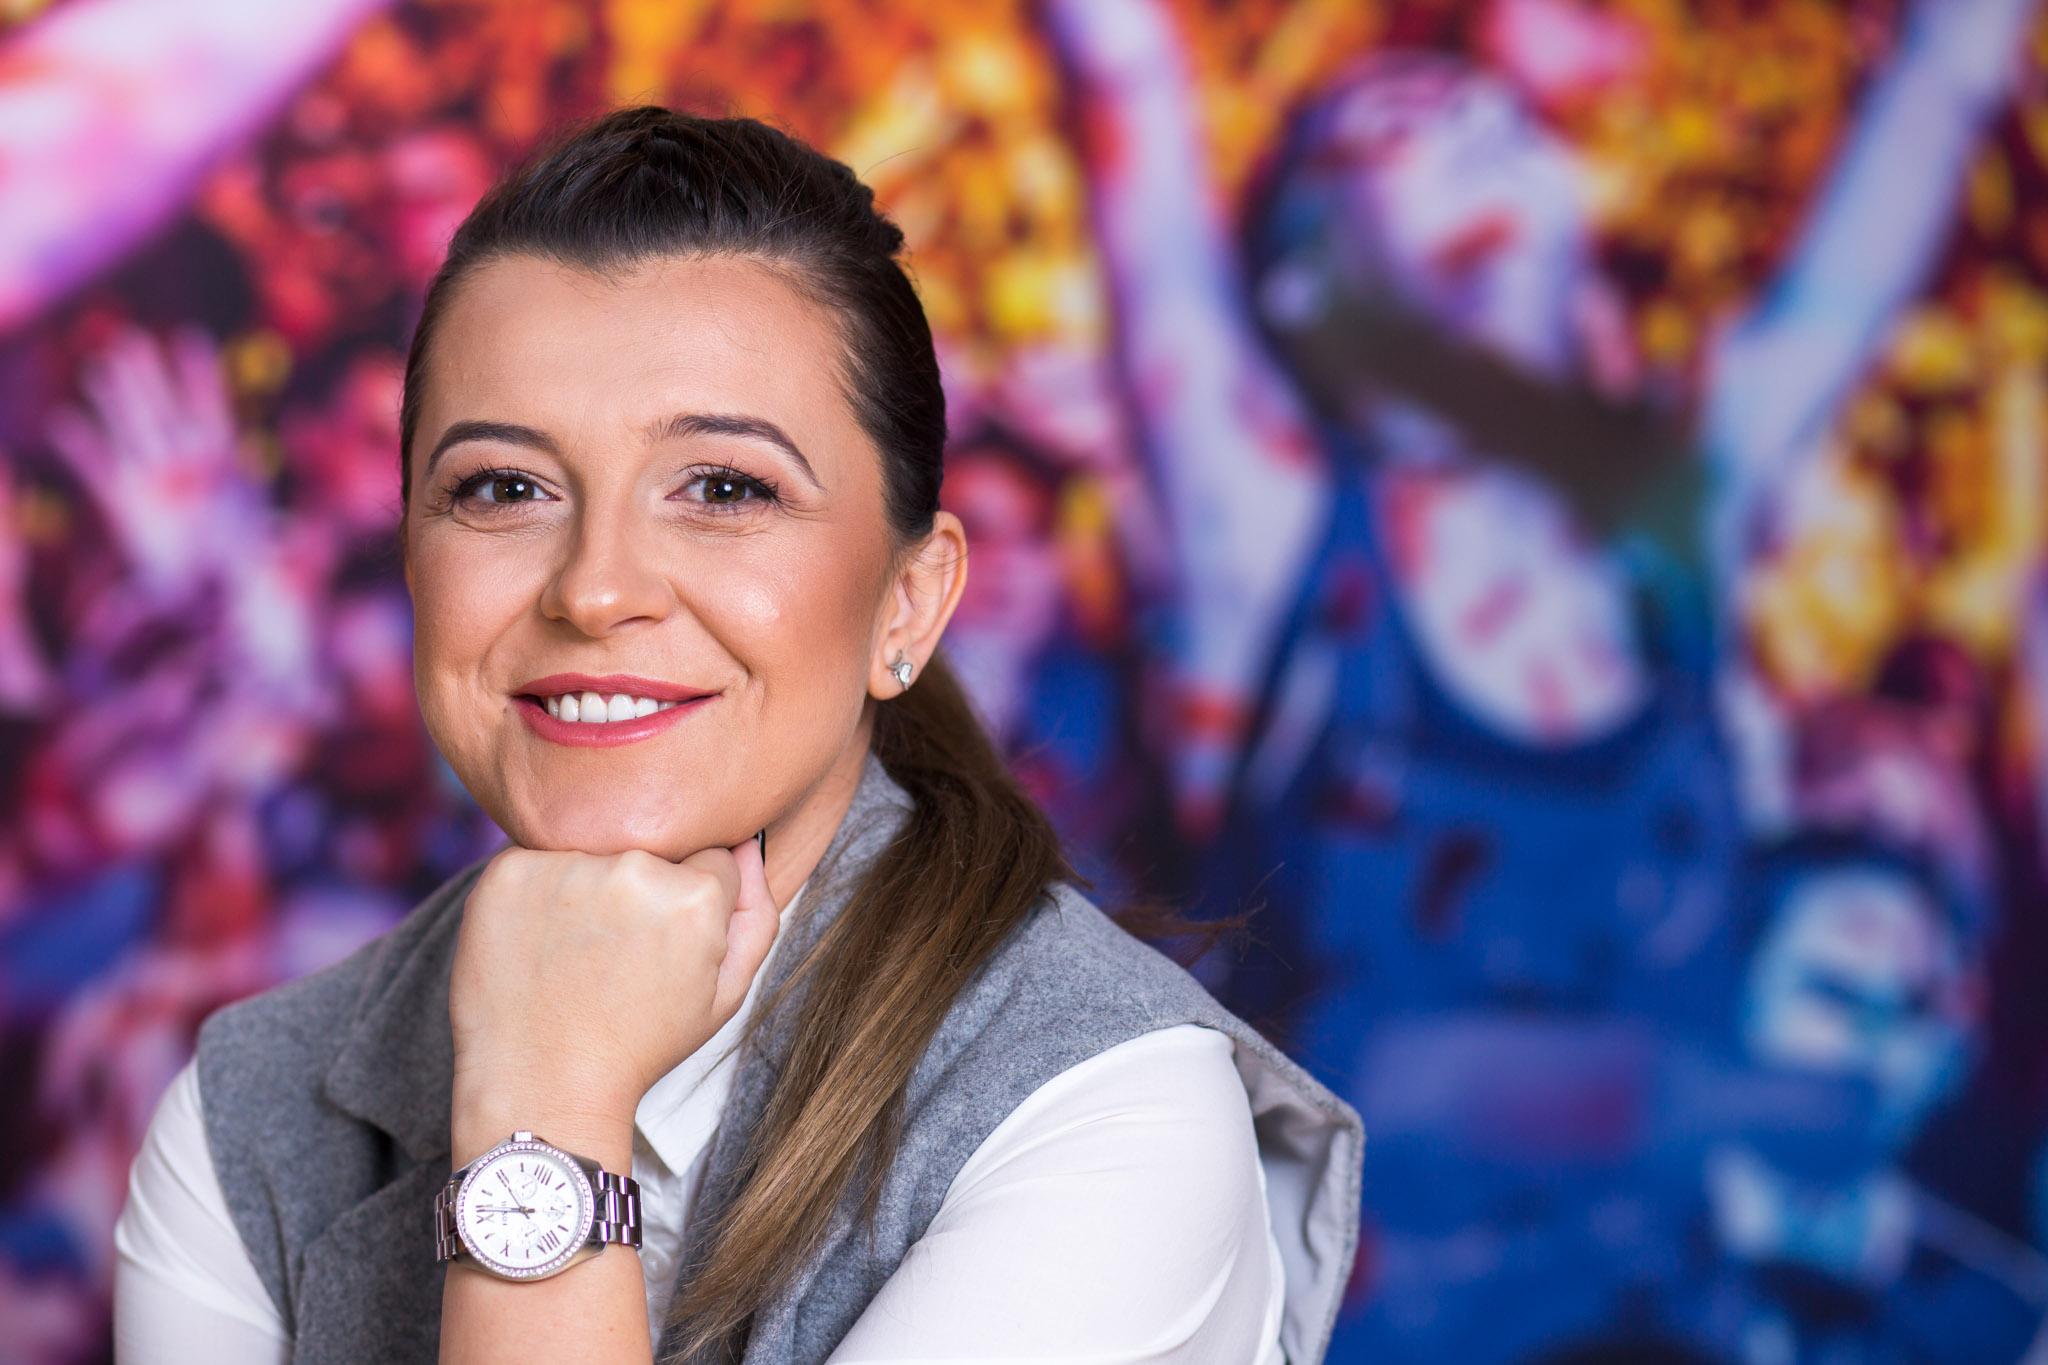 Ioana Chifor